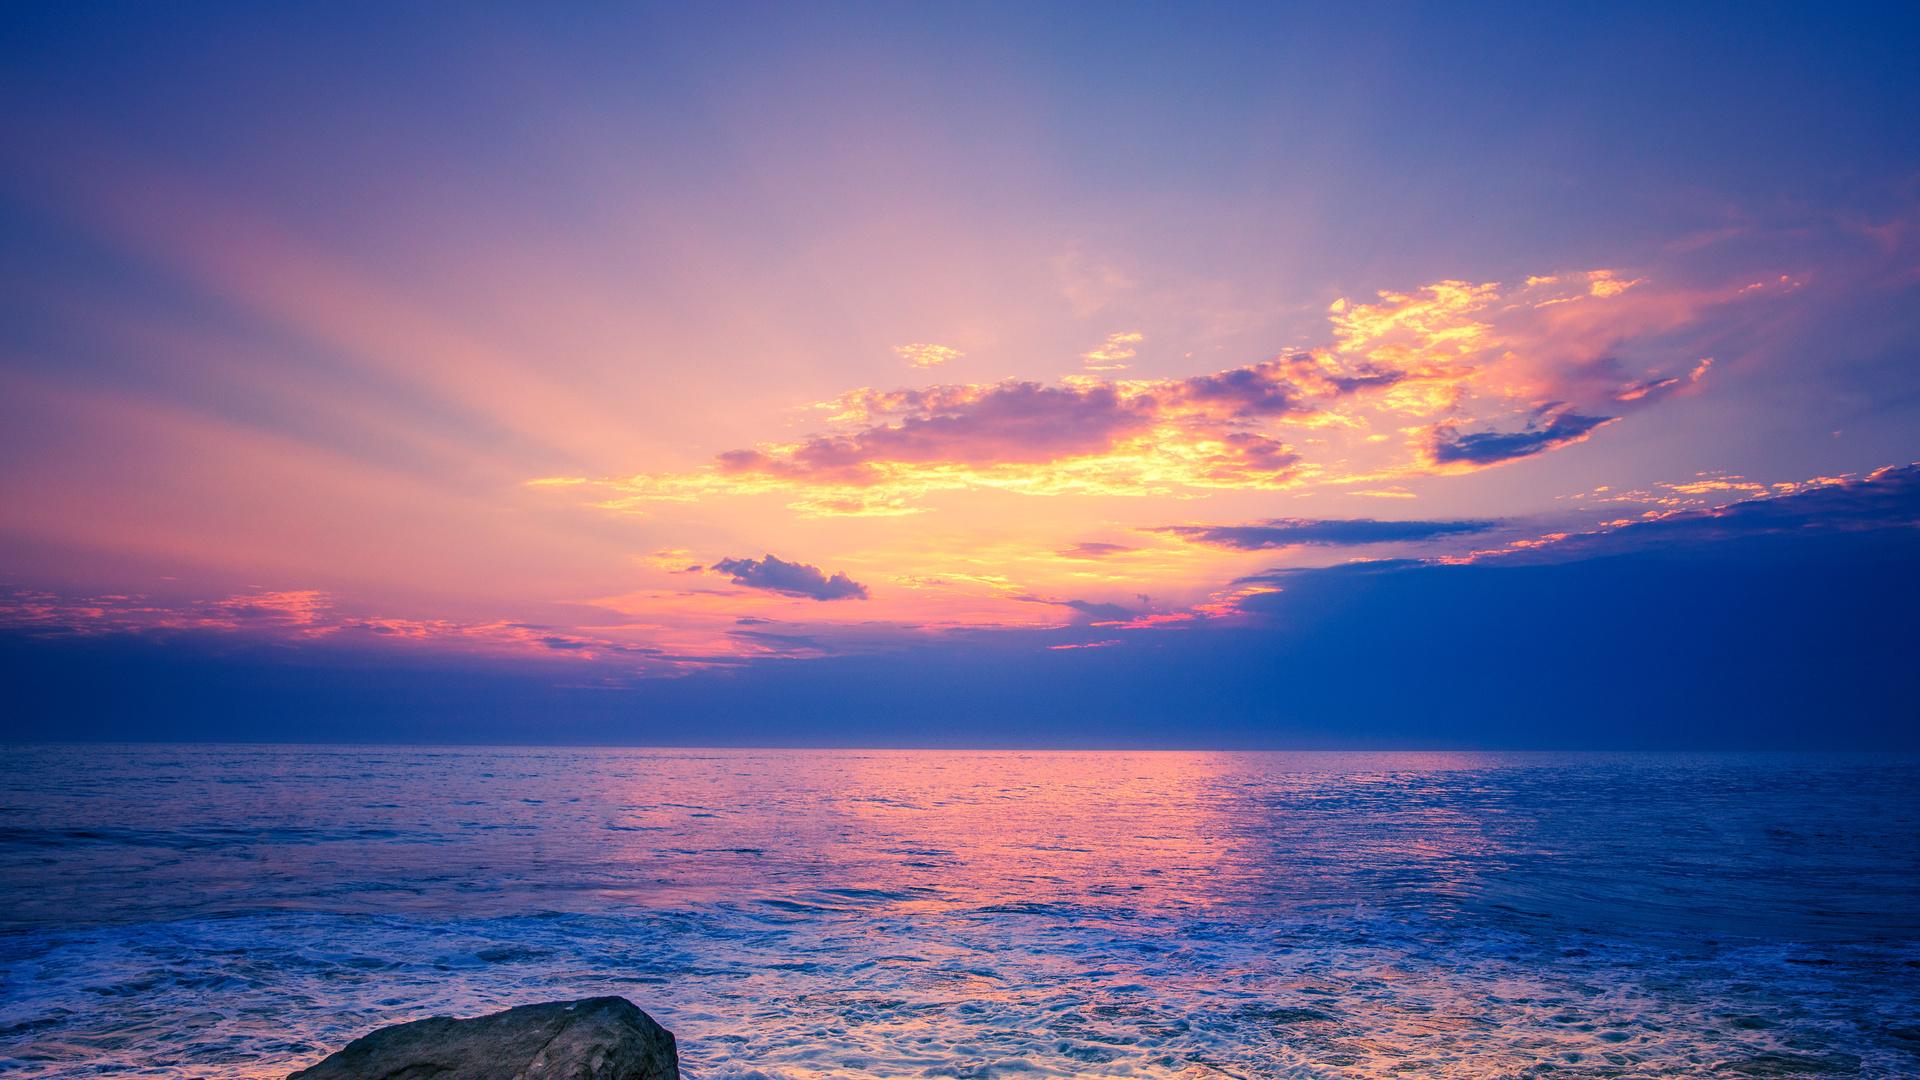 горизонт, море, небо, закат